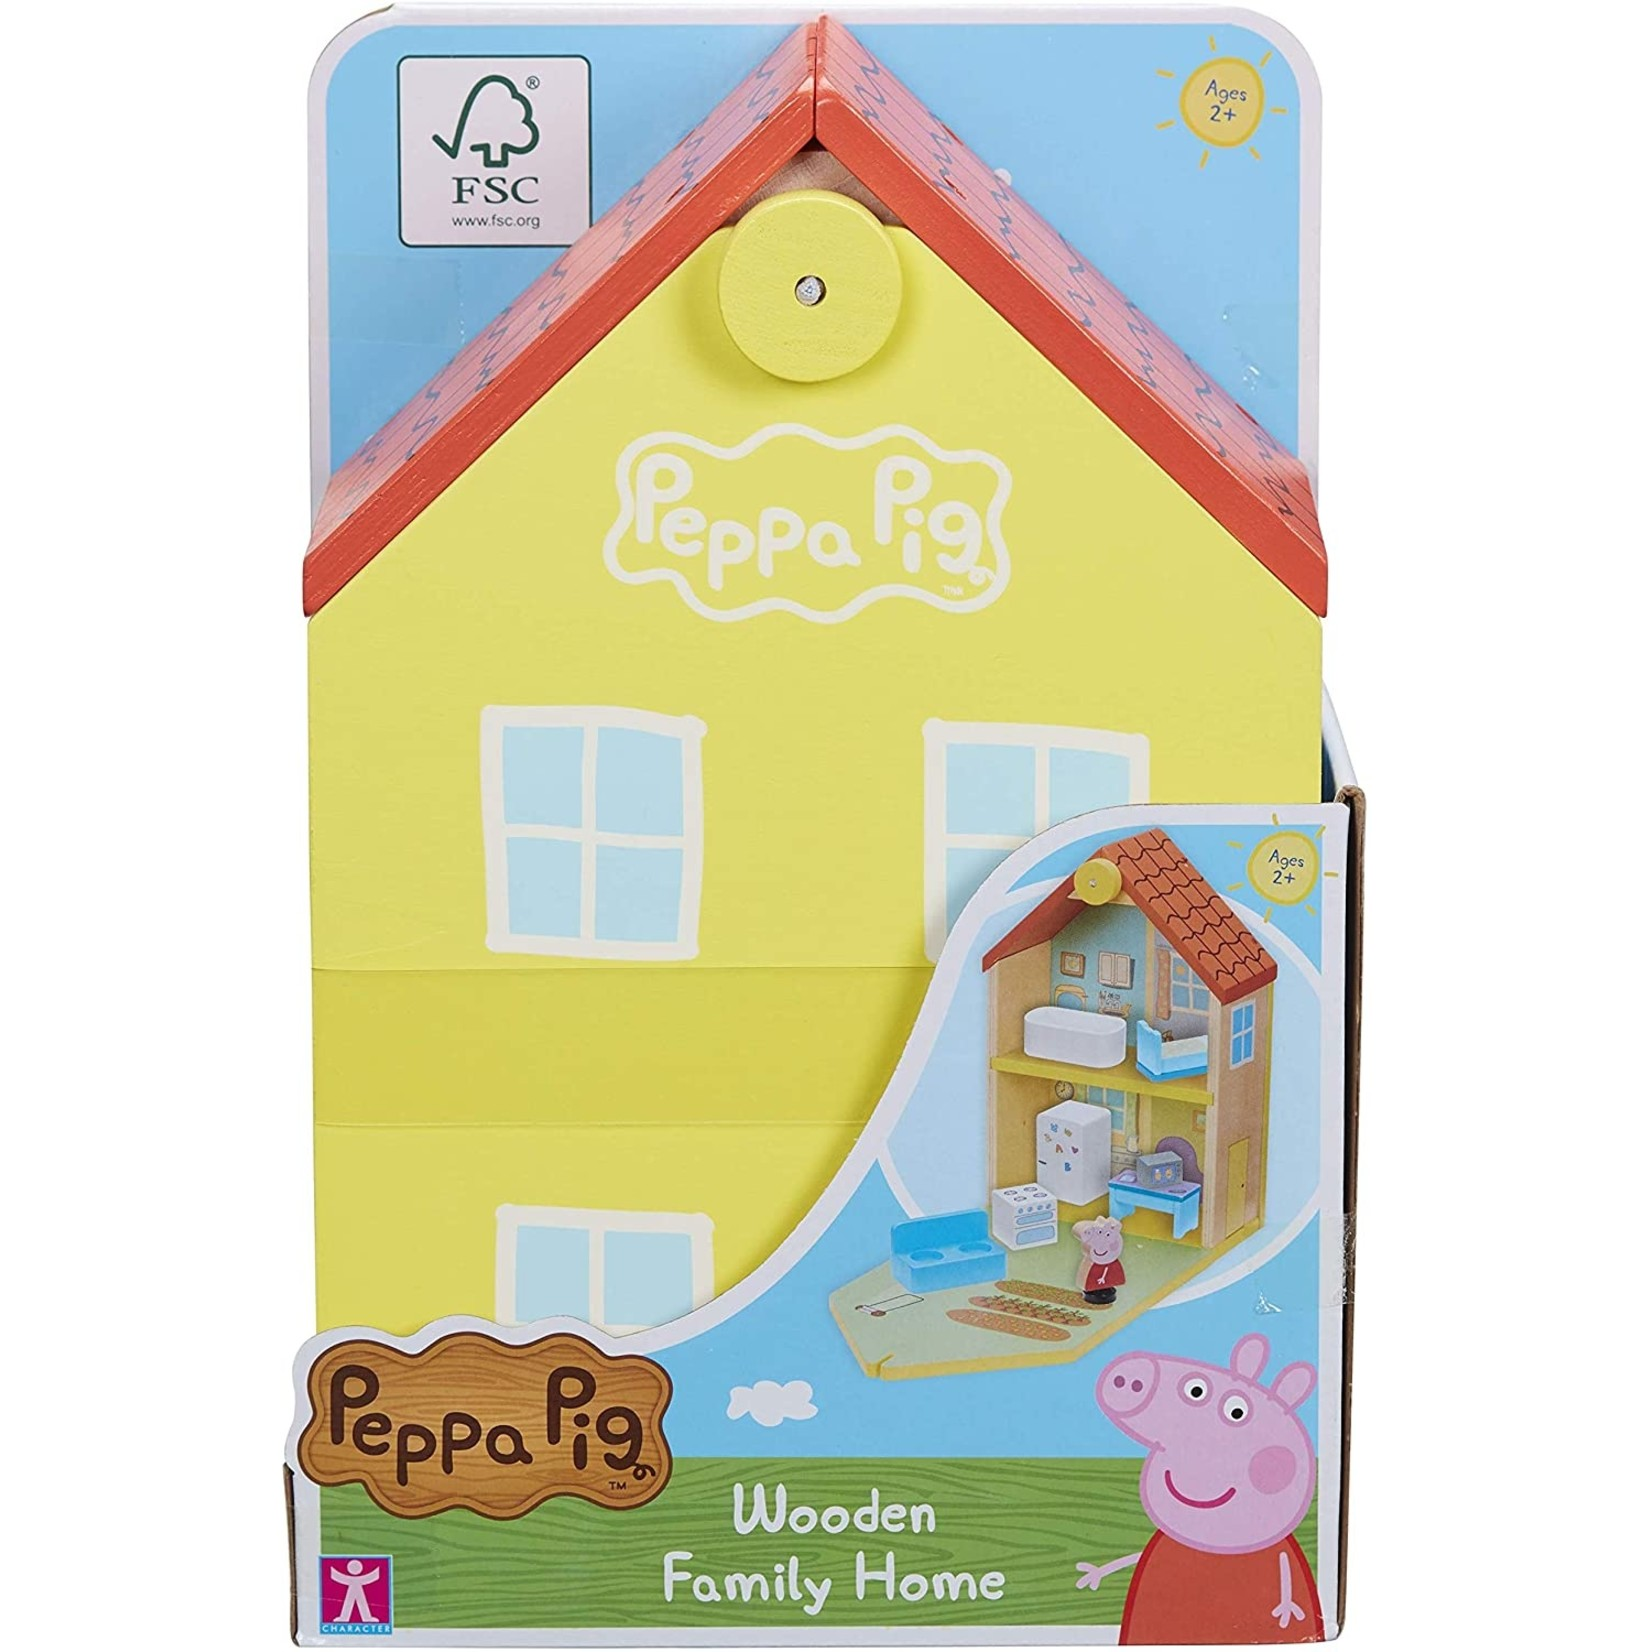 Peppa Pig's Houten Familiehuis